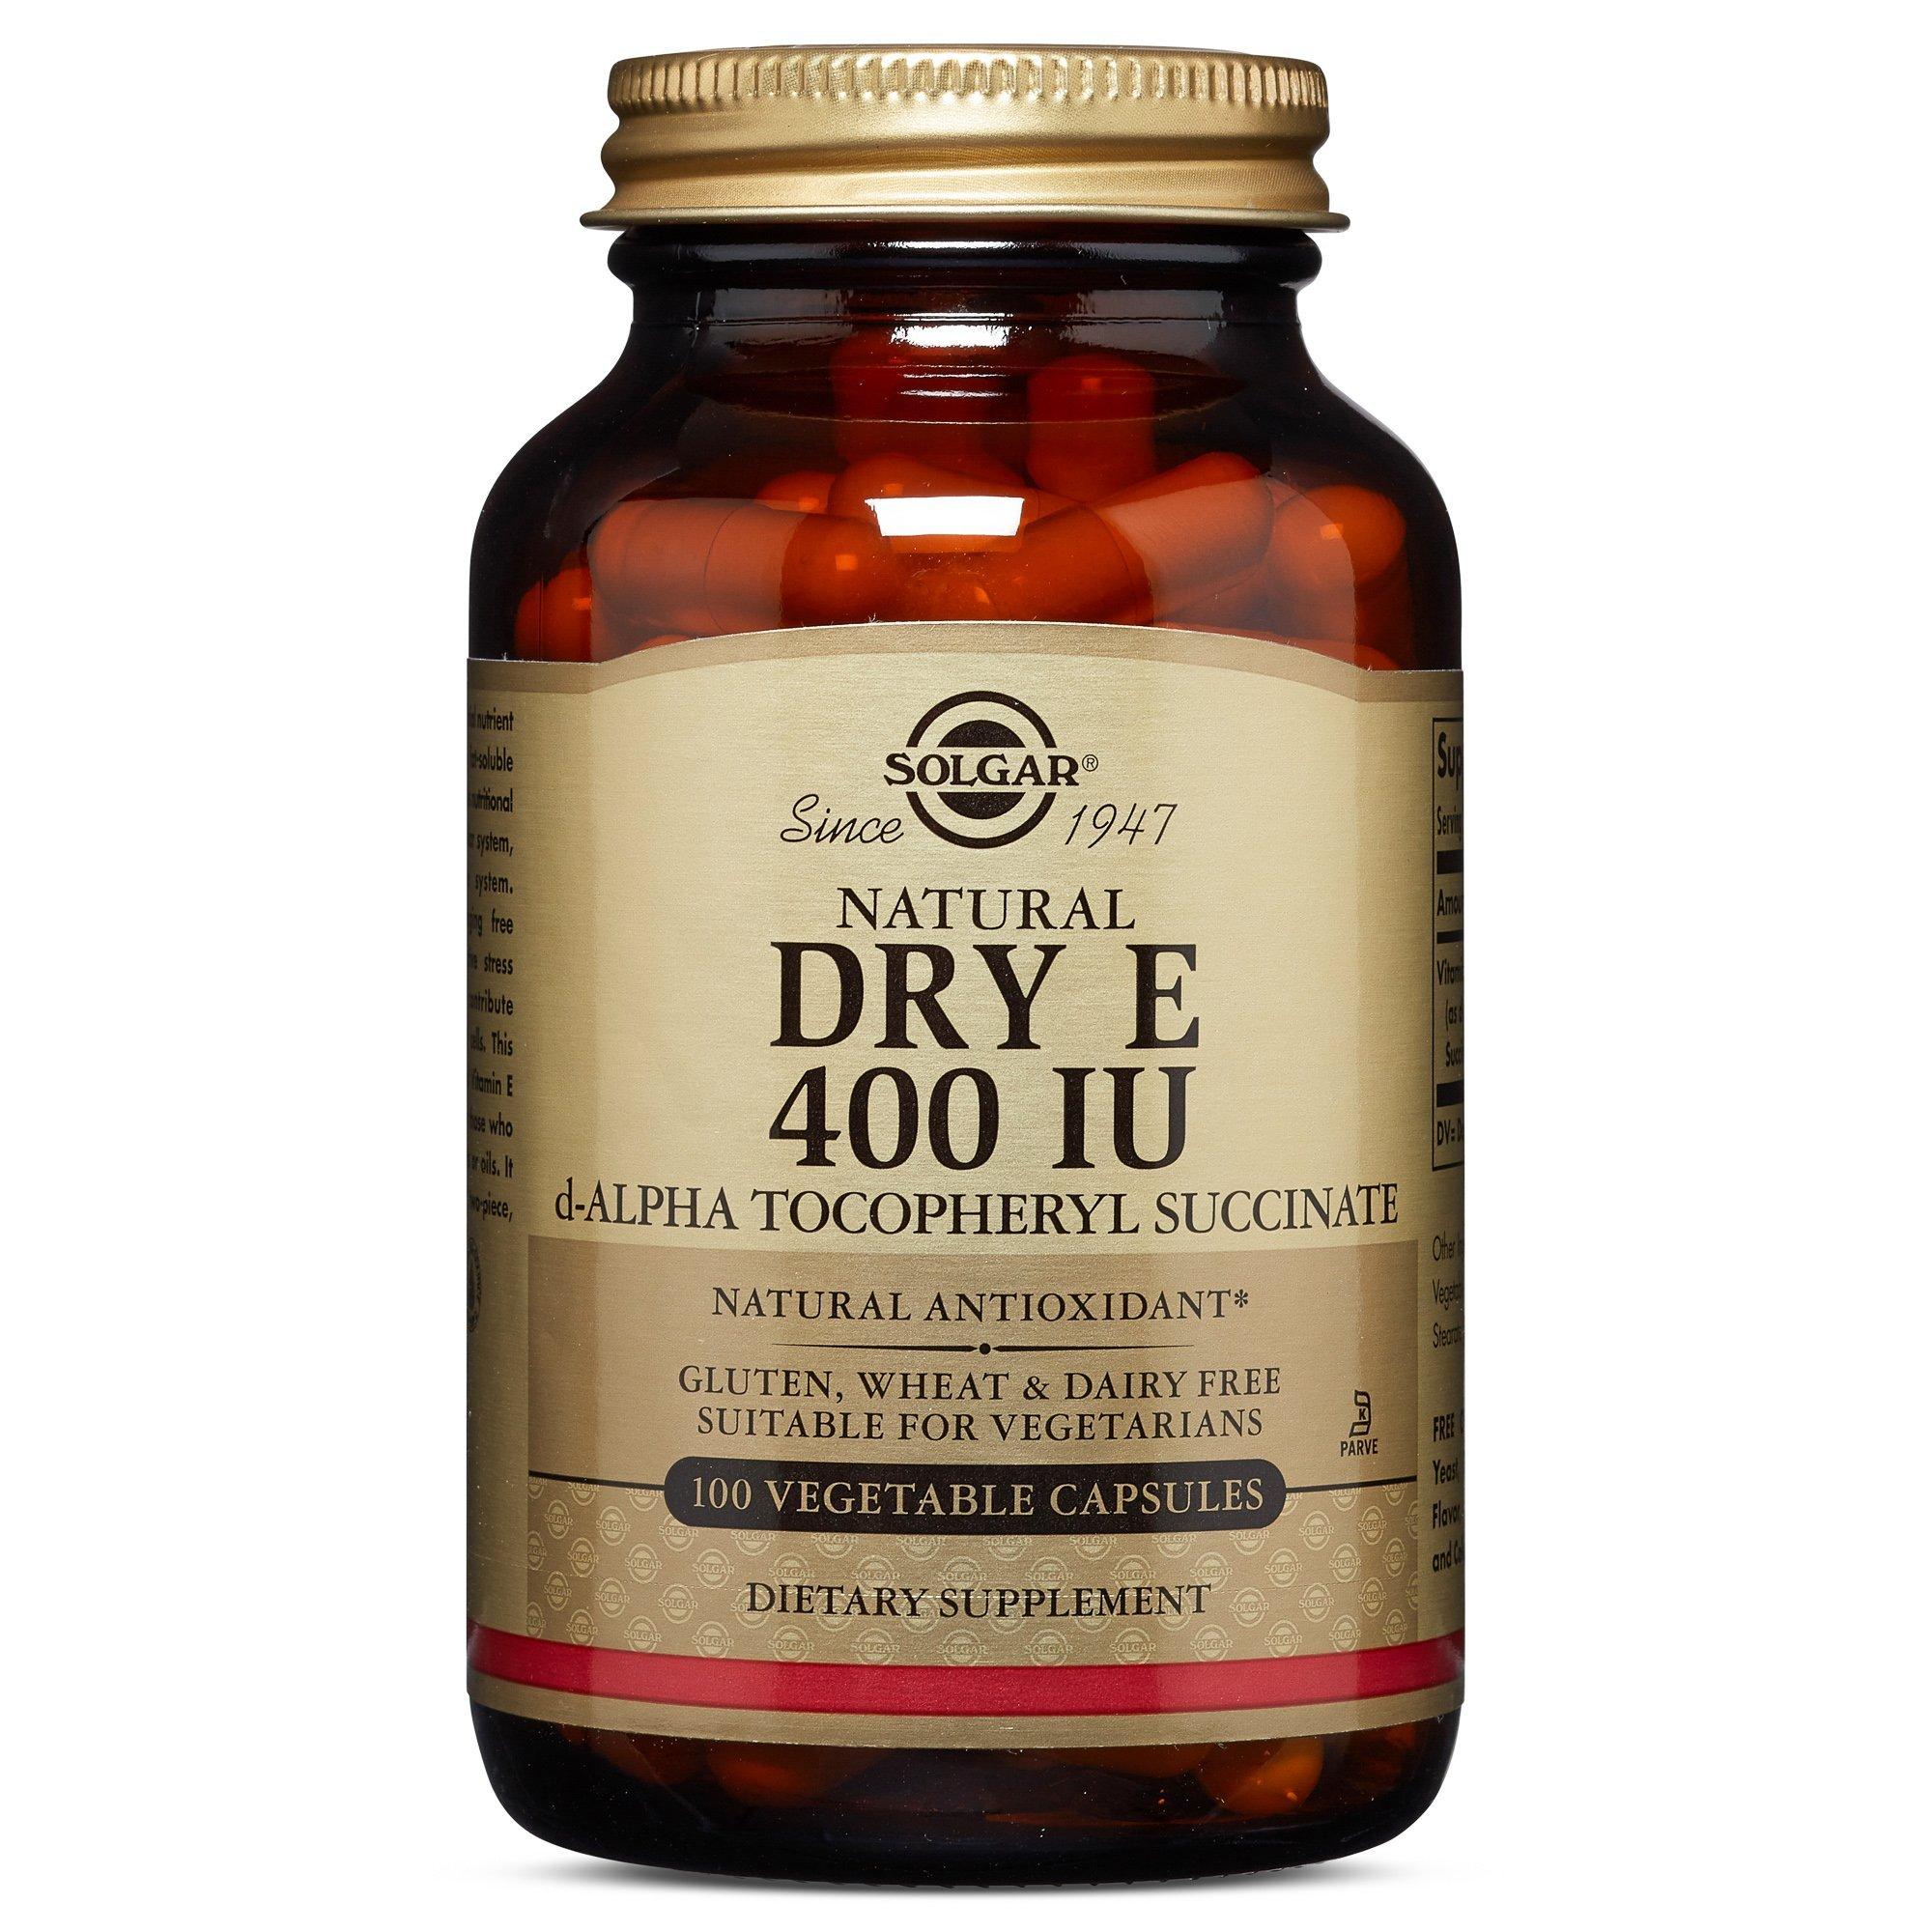 Solgar - Dry Vitamin E 400 IU (d-Alpha Tocopheryl Succinate) 100 Vegetable Capsules